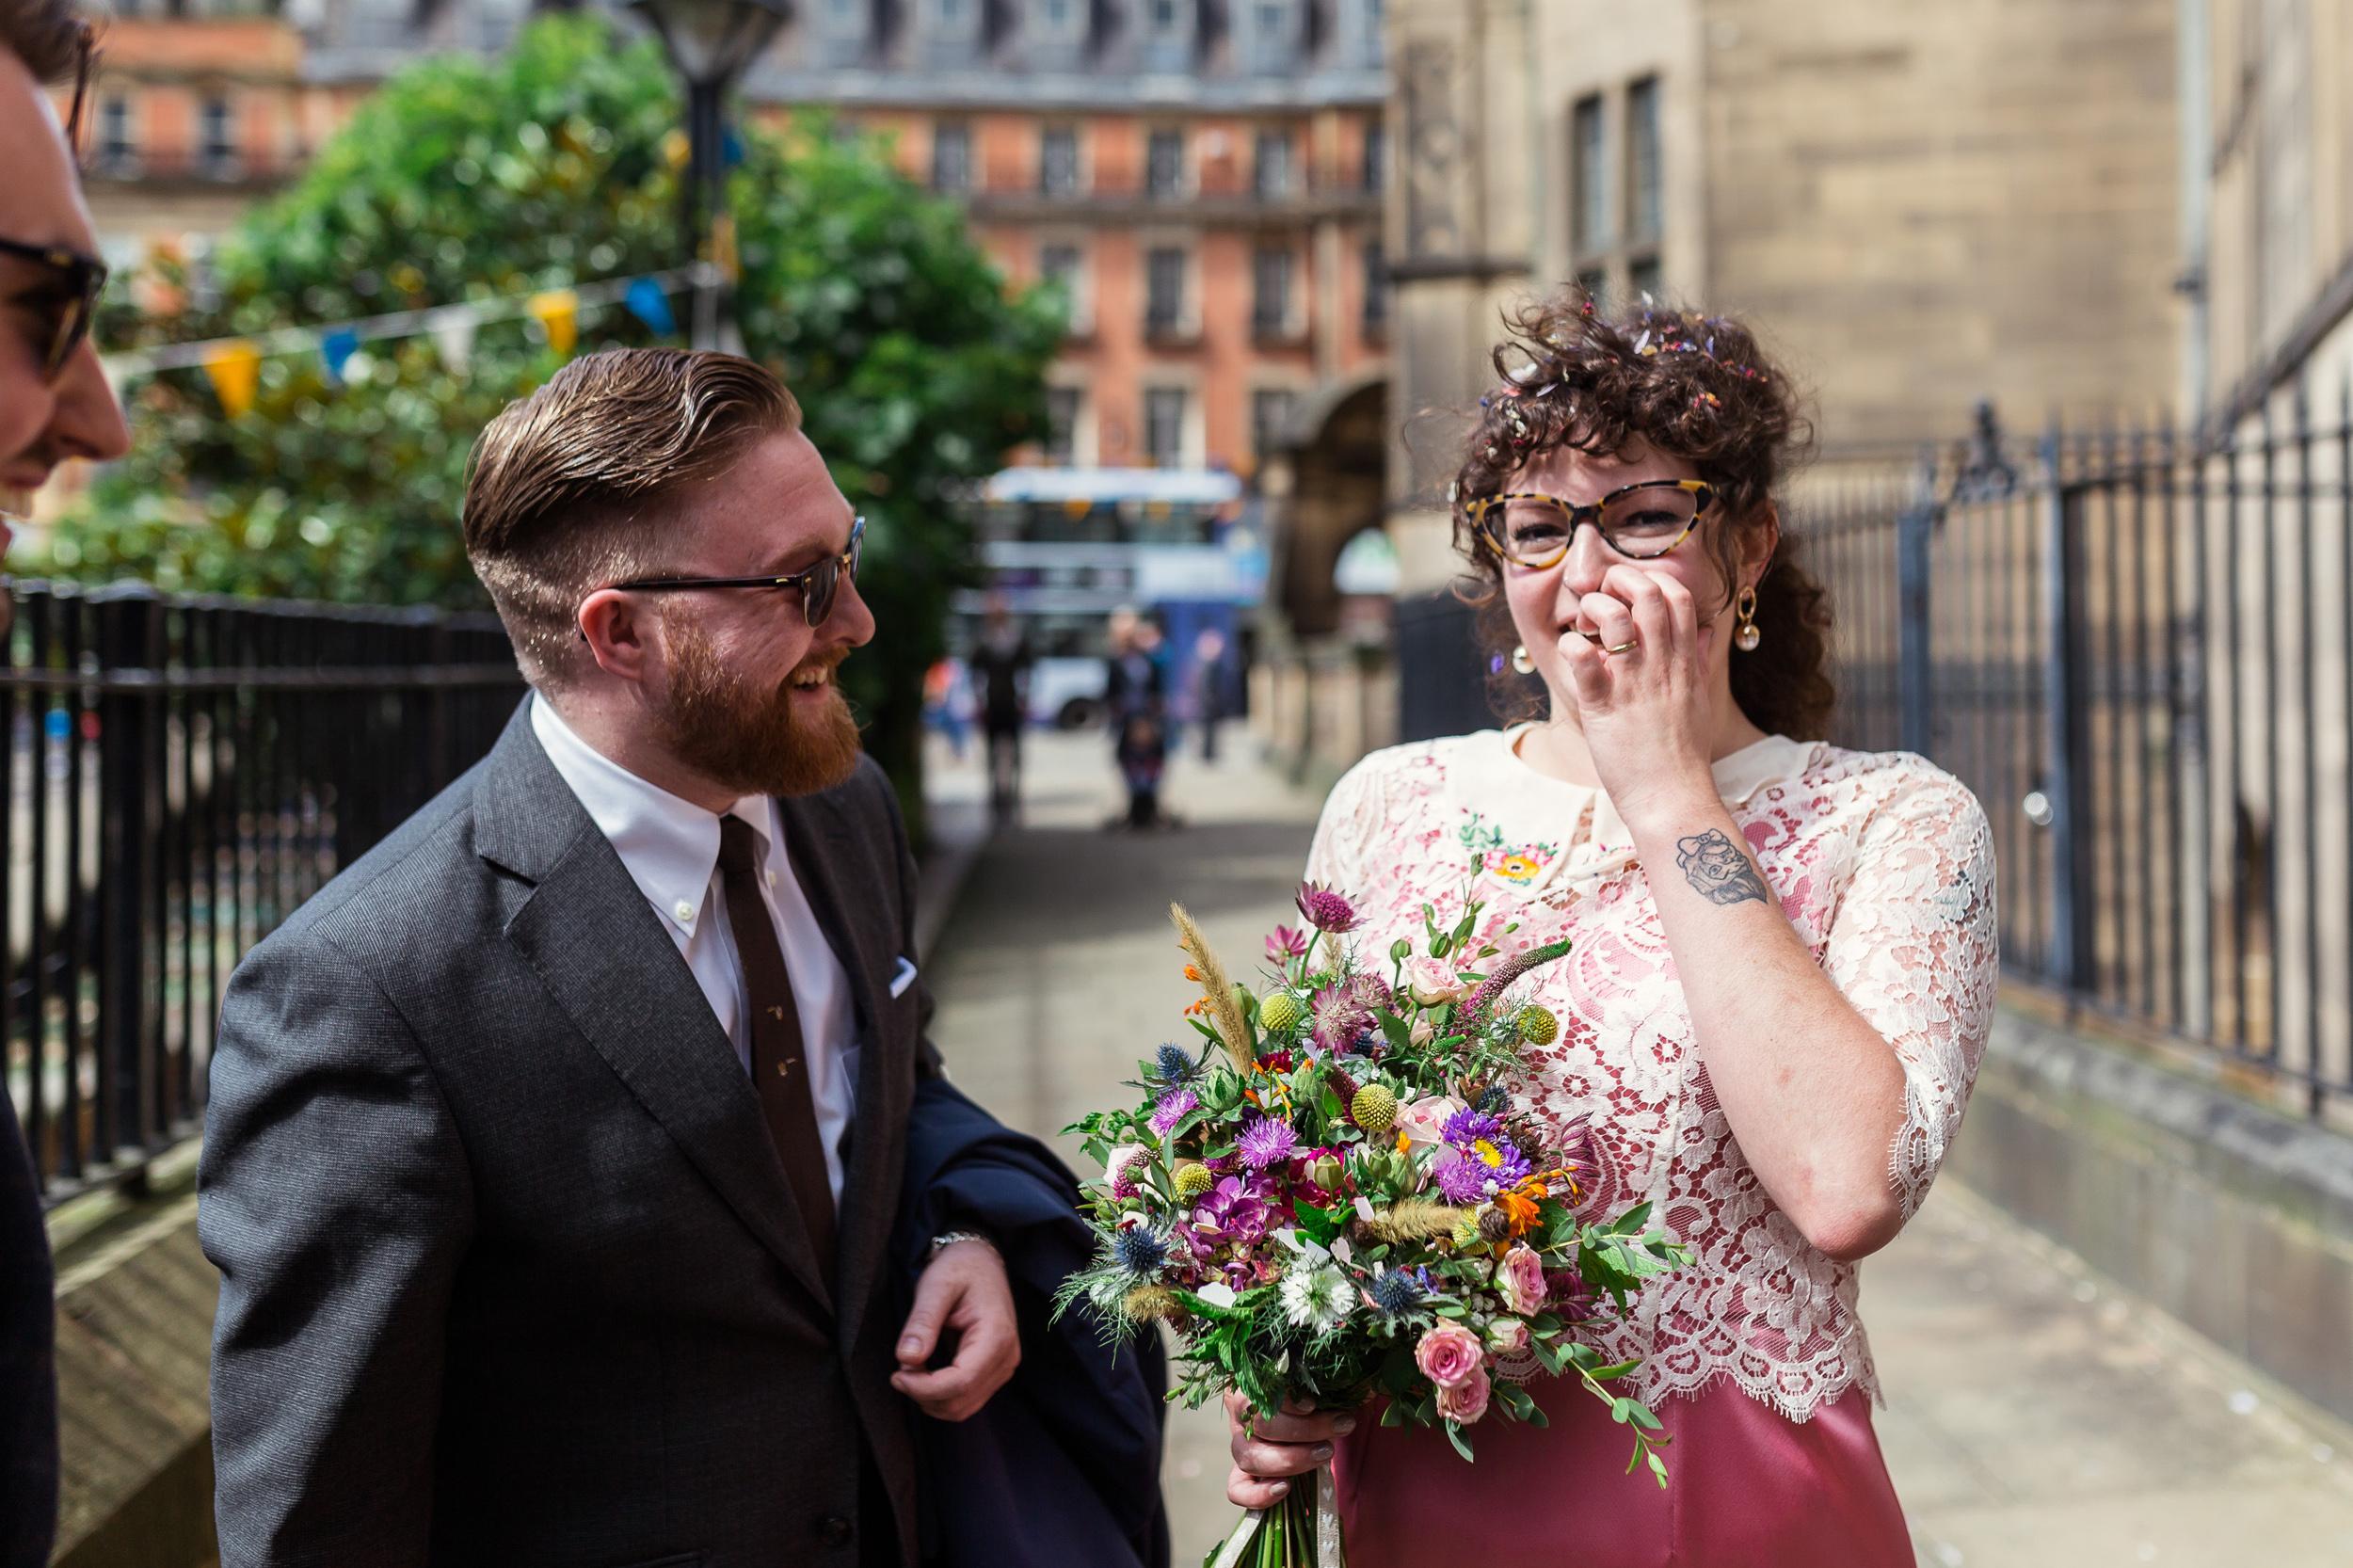 Emma-Coloured-Wedding-Dress-Sheffield-Kate-Beaumont-11.jpg